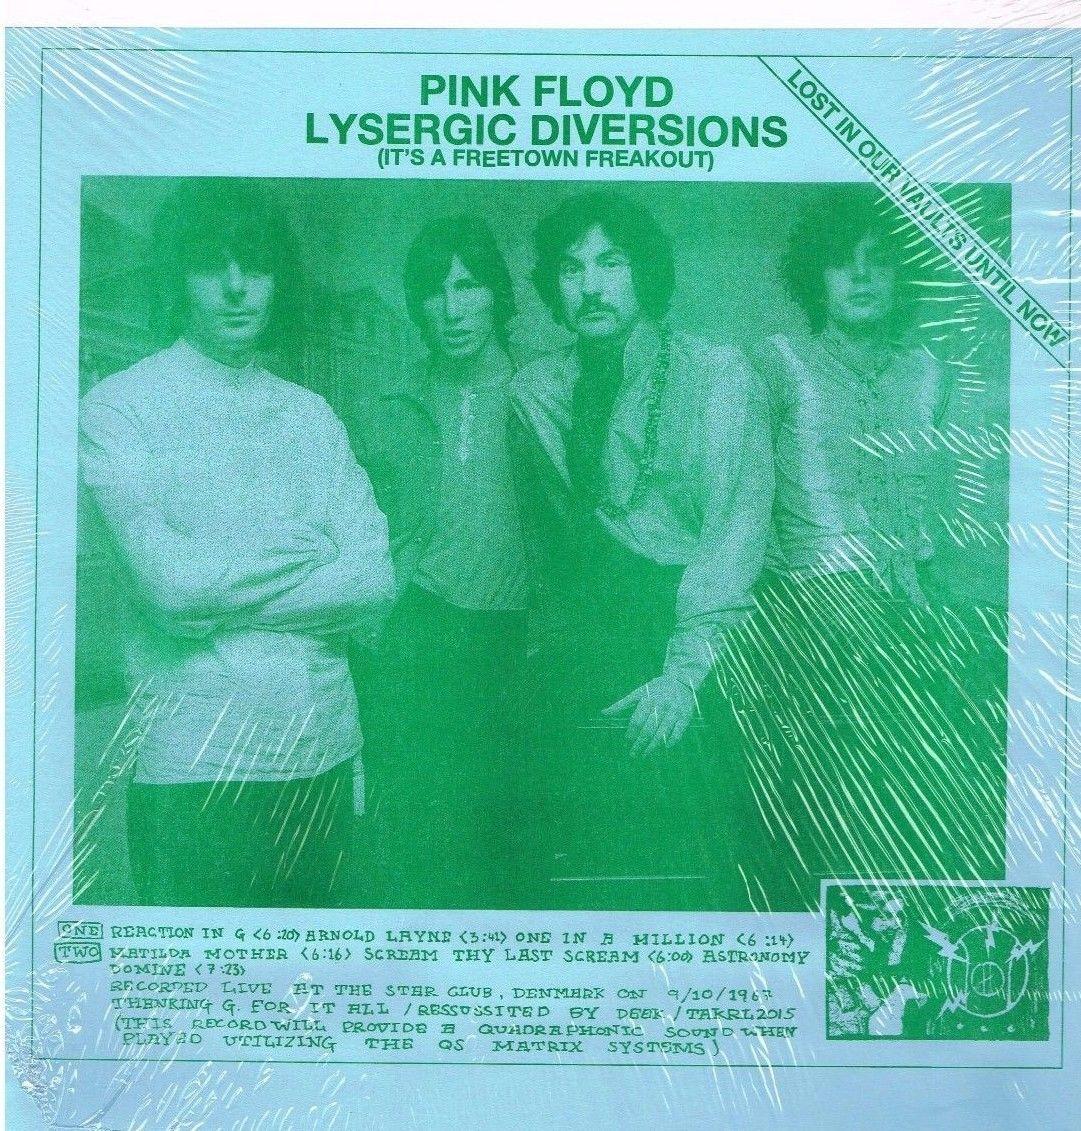 Pink Floyd Lysergic Diversions